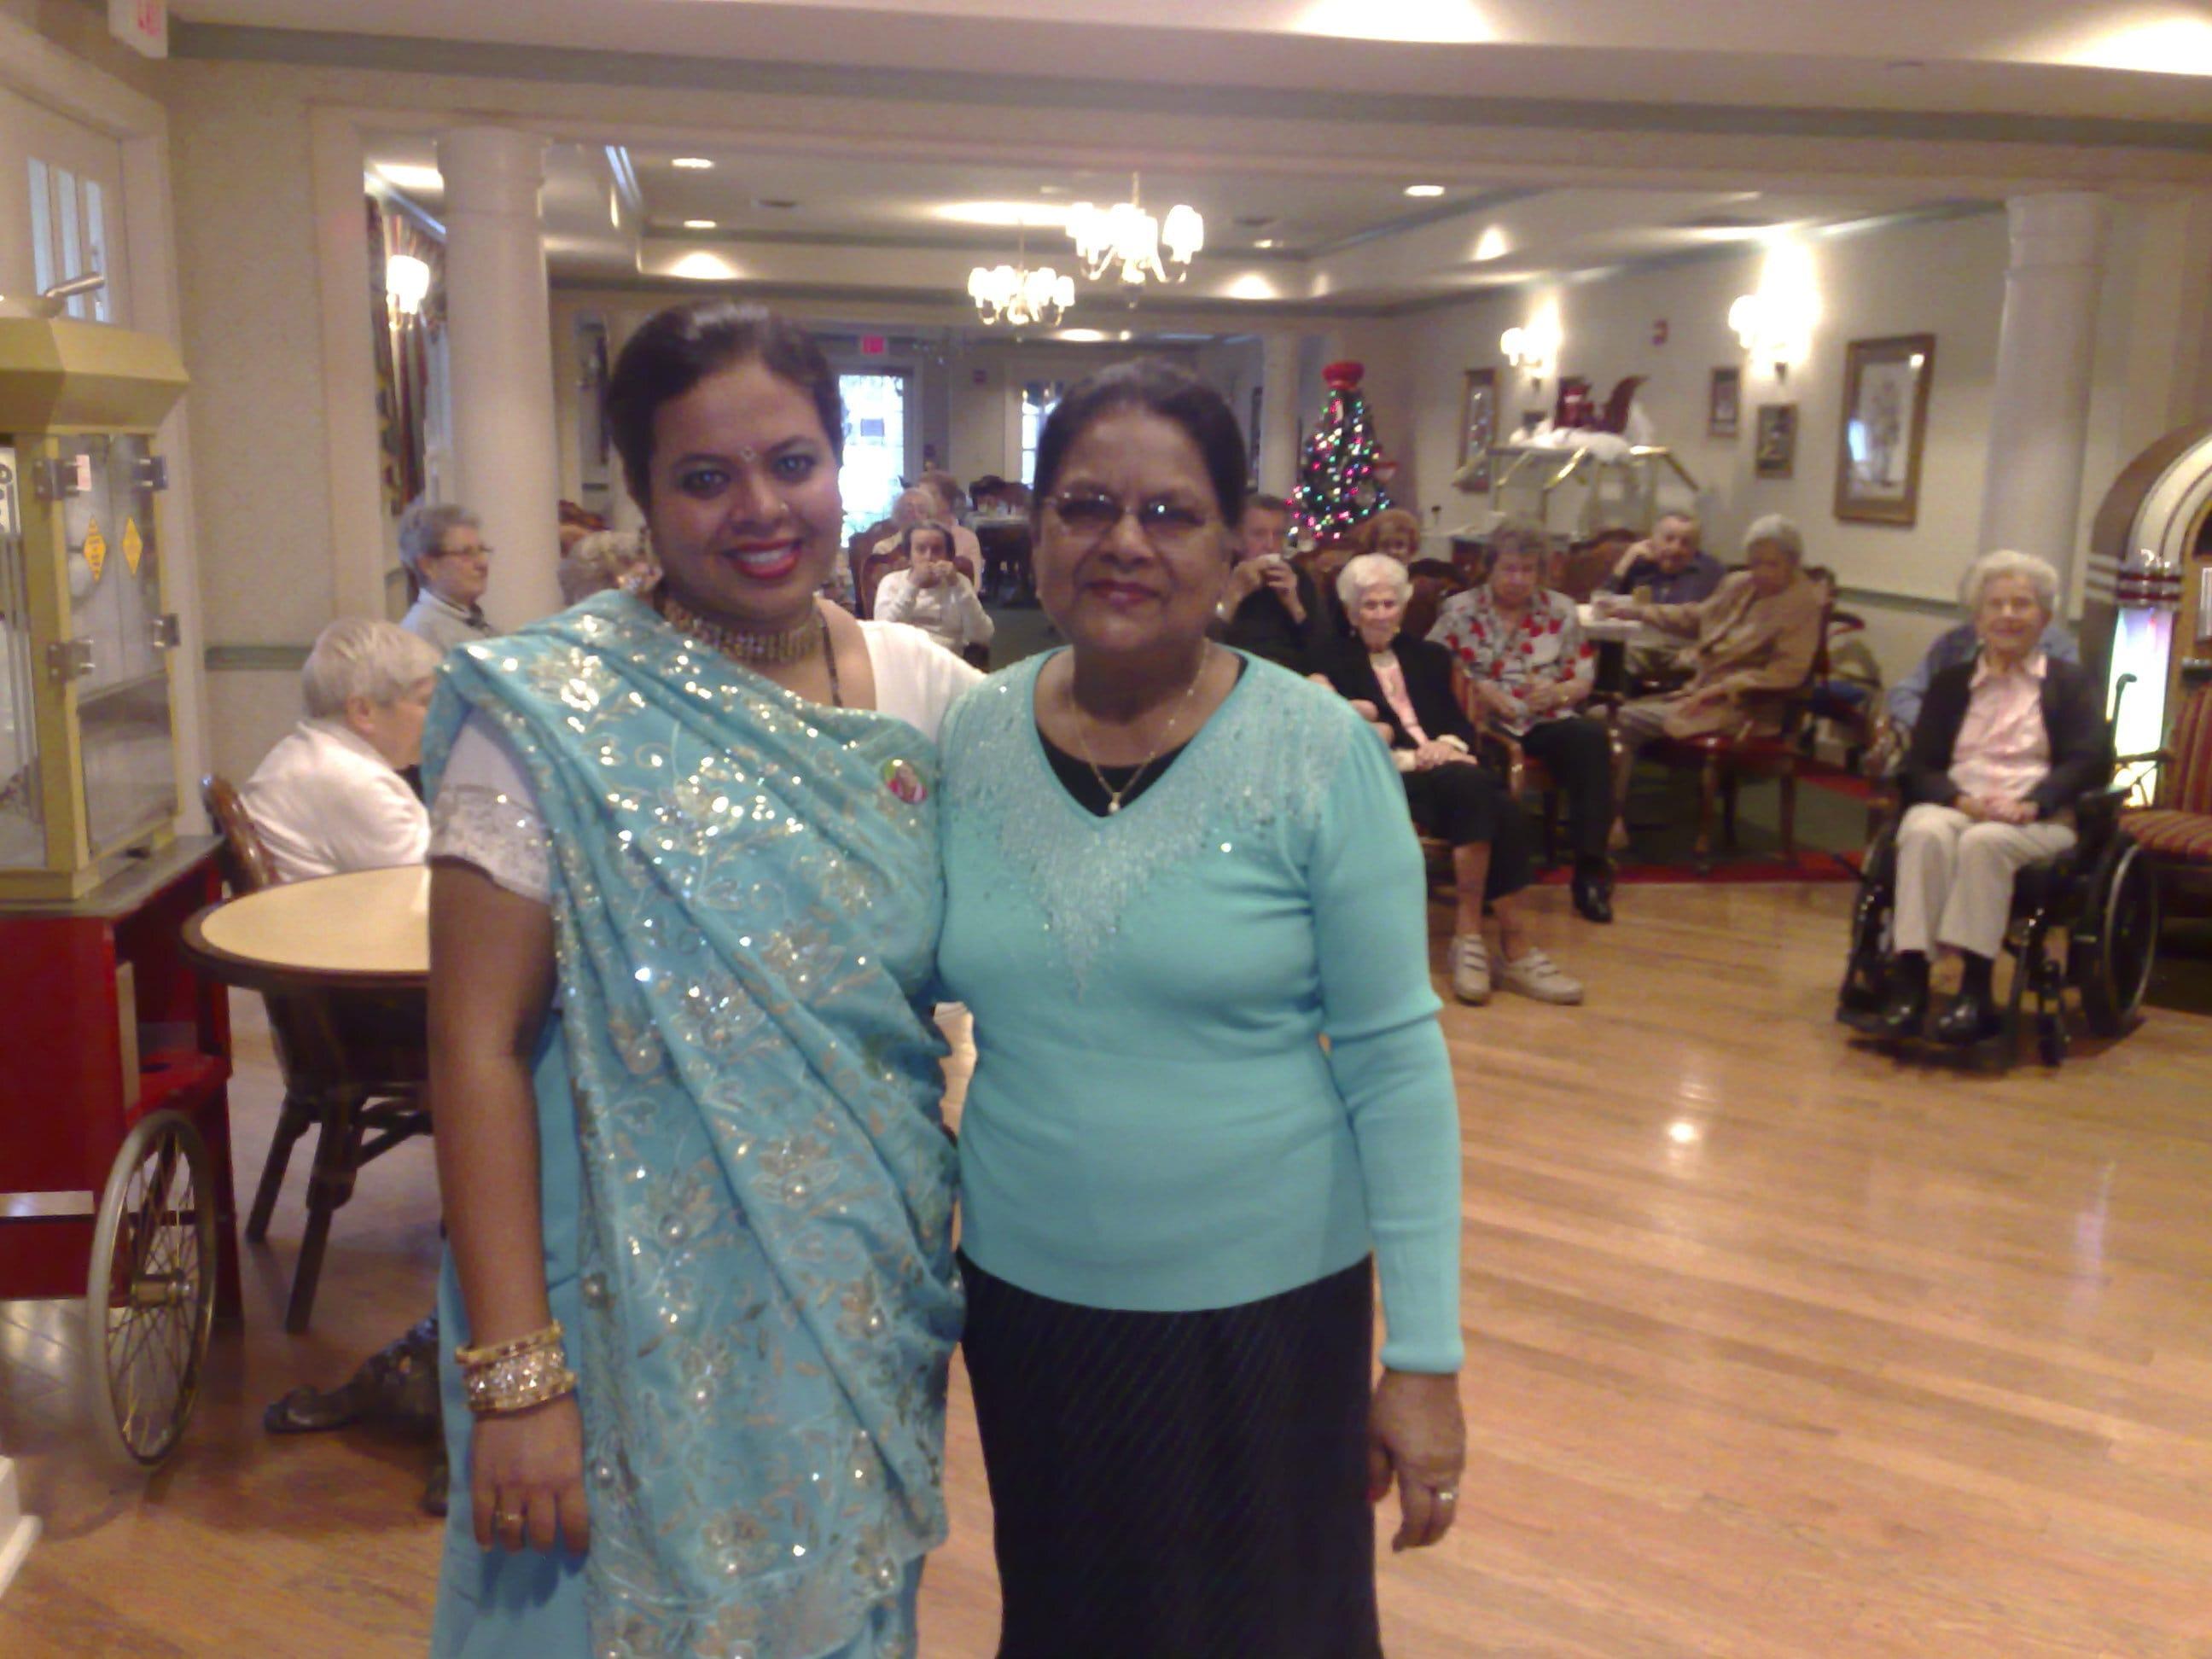 Anandita reconnected with Senior lady that had practised Sahaja Yoga in Montreal many years ago